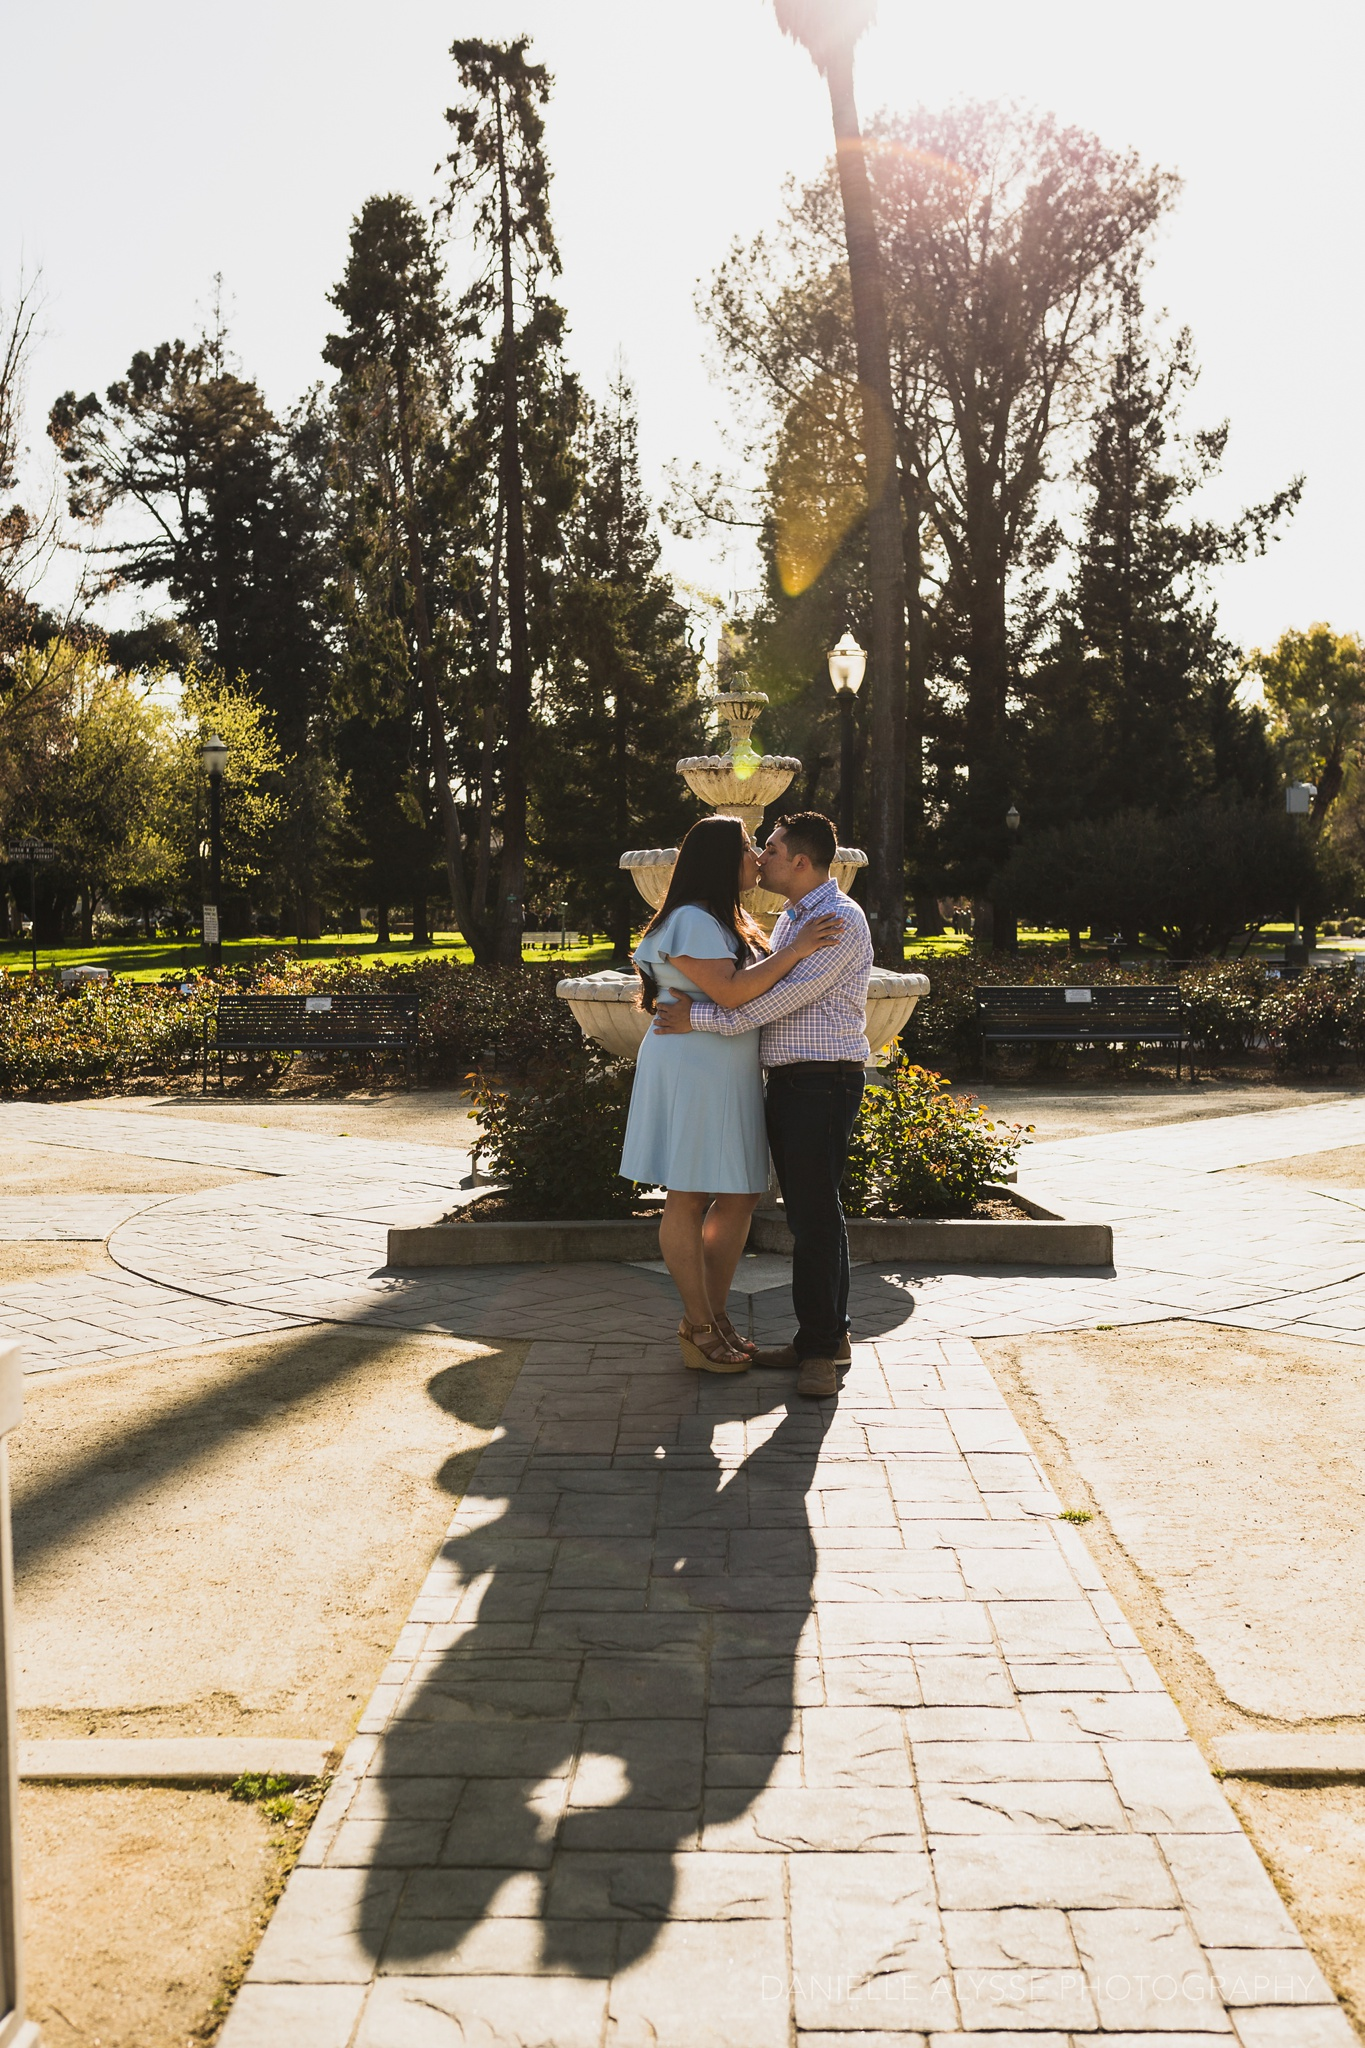 180324_engagement_lily_danielle_alysse_photography_downtown_sacramento_wedding_photographer_blog_2_WEB.jpg